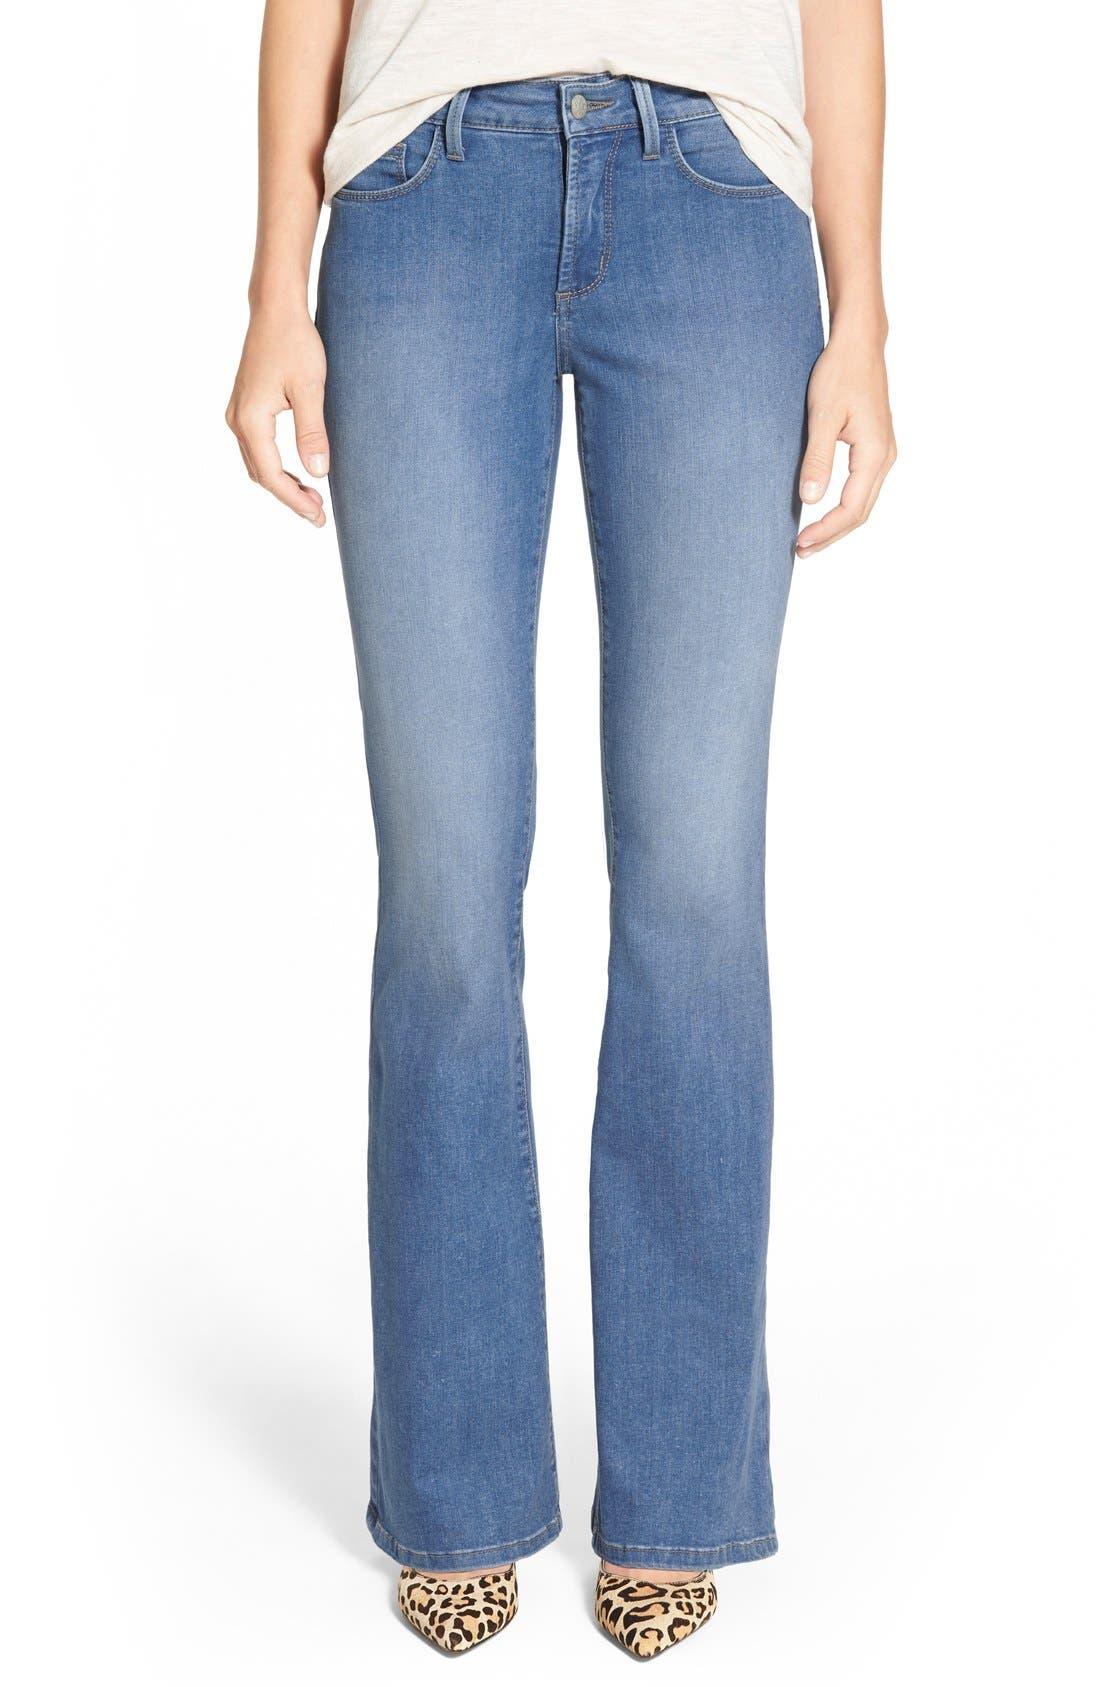 Alternate Image 1 Selected - NYDJ 'Farrah' Stretch Flare Leg Jeans (Upper Falls)